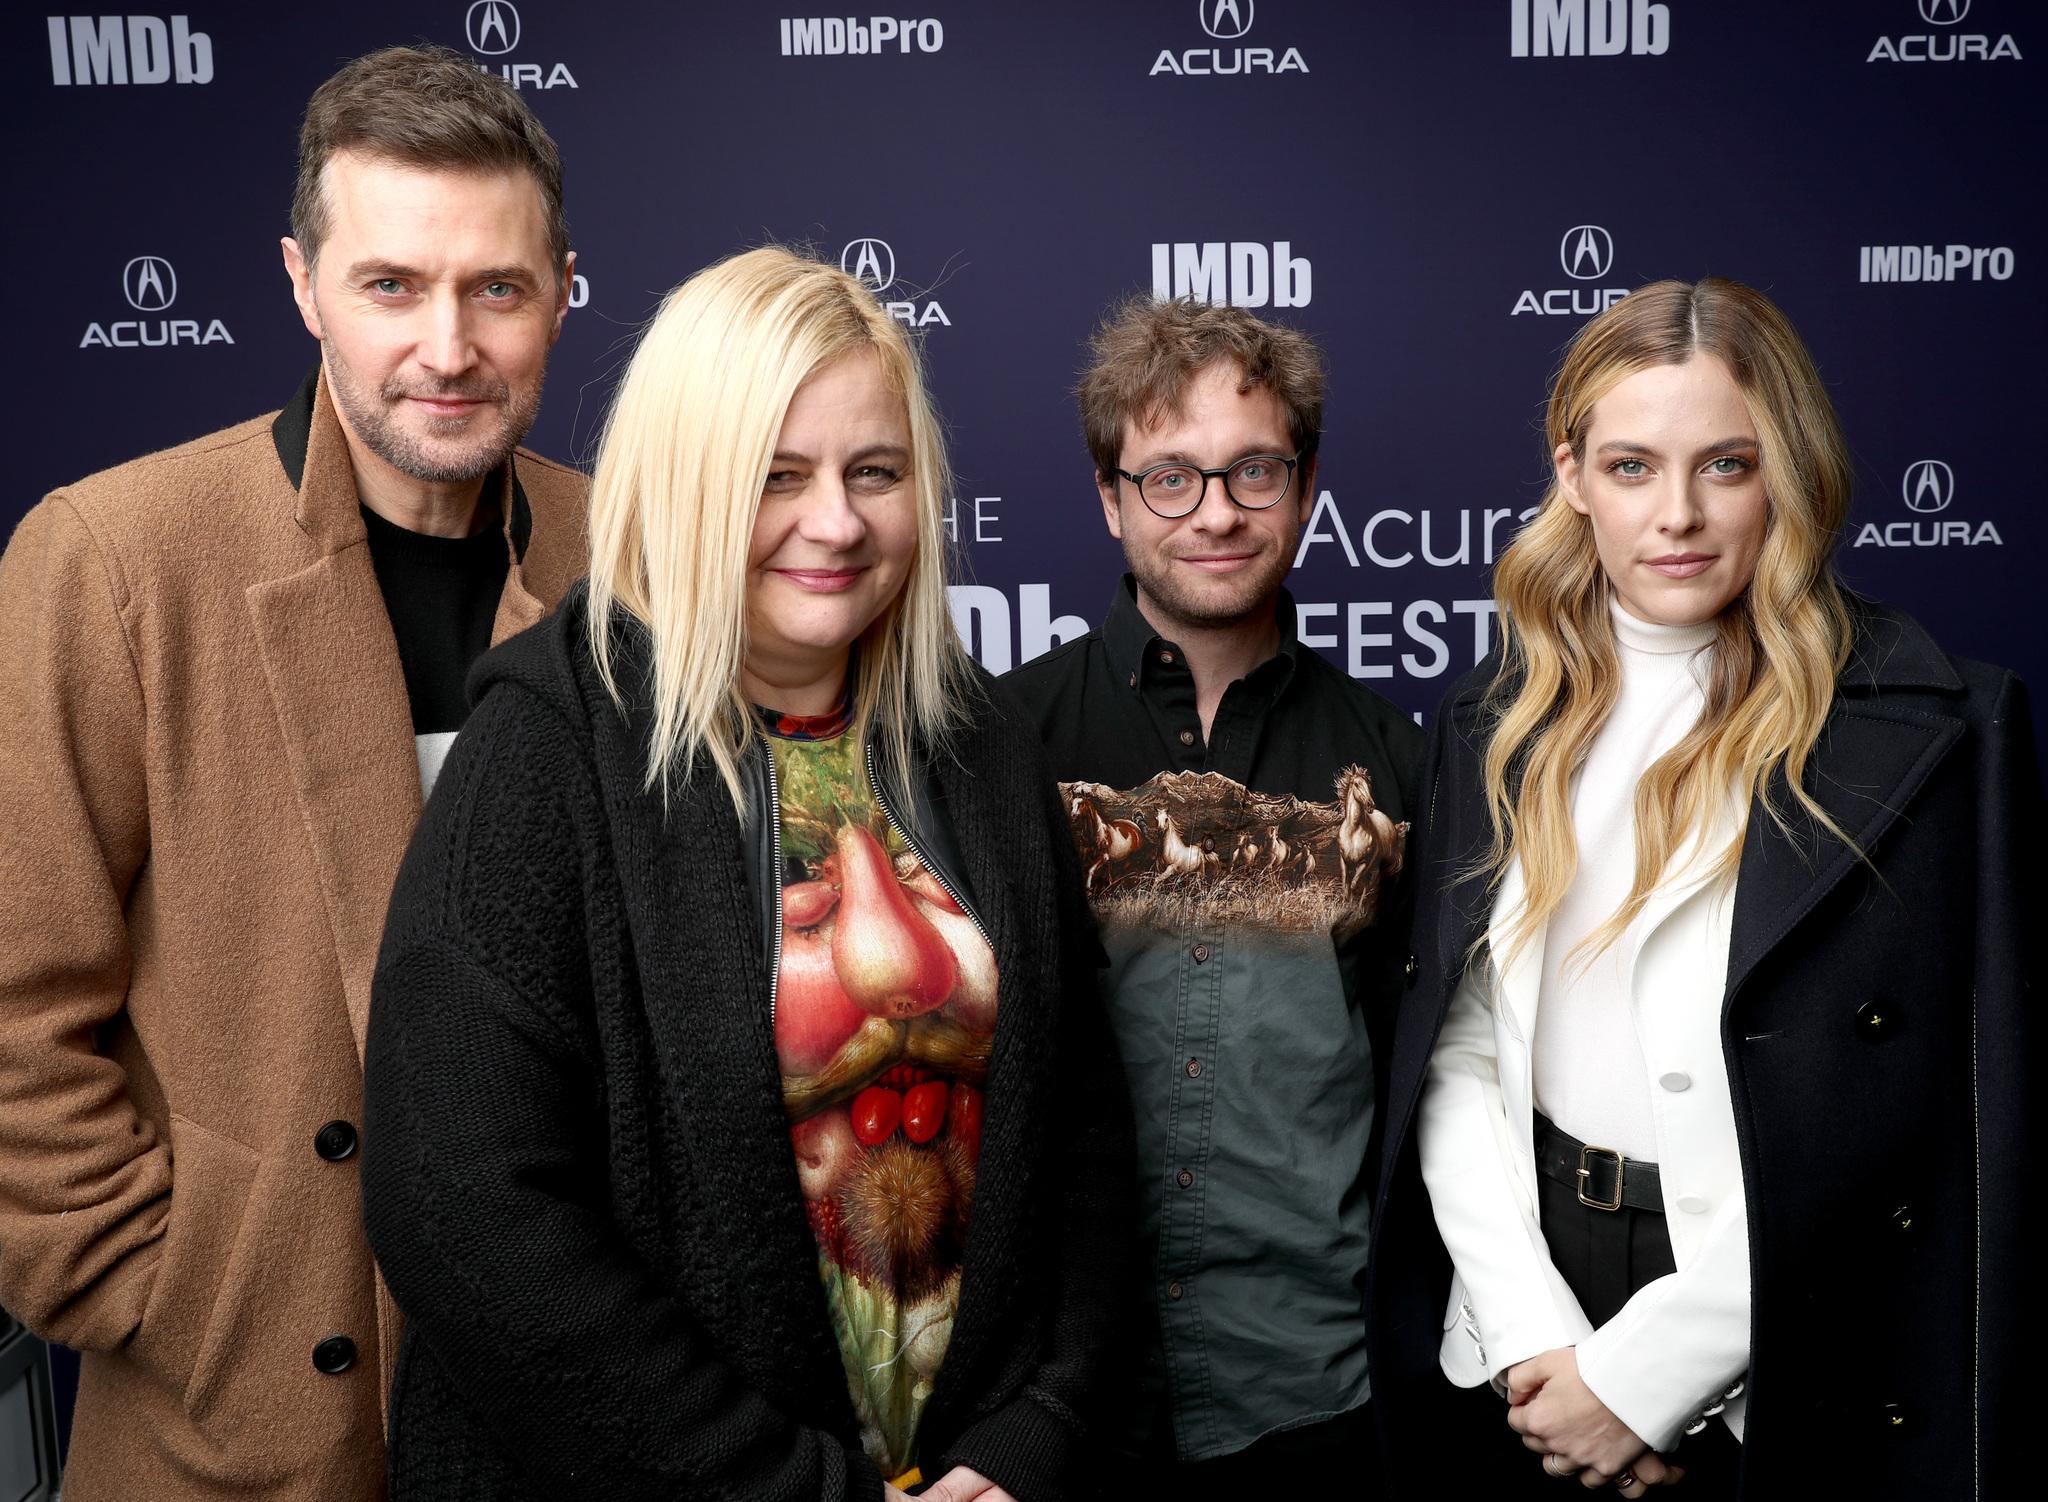 Richard Armitage, Veronika Franz, Riley Keough, and Severin Fiala at an event for The IMDb Studio at Sundance (2015)